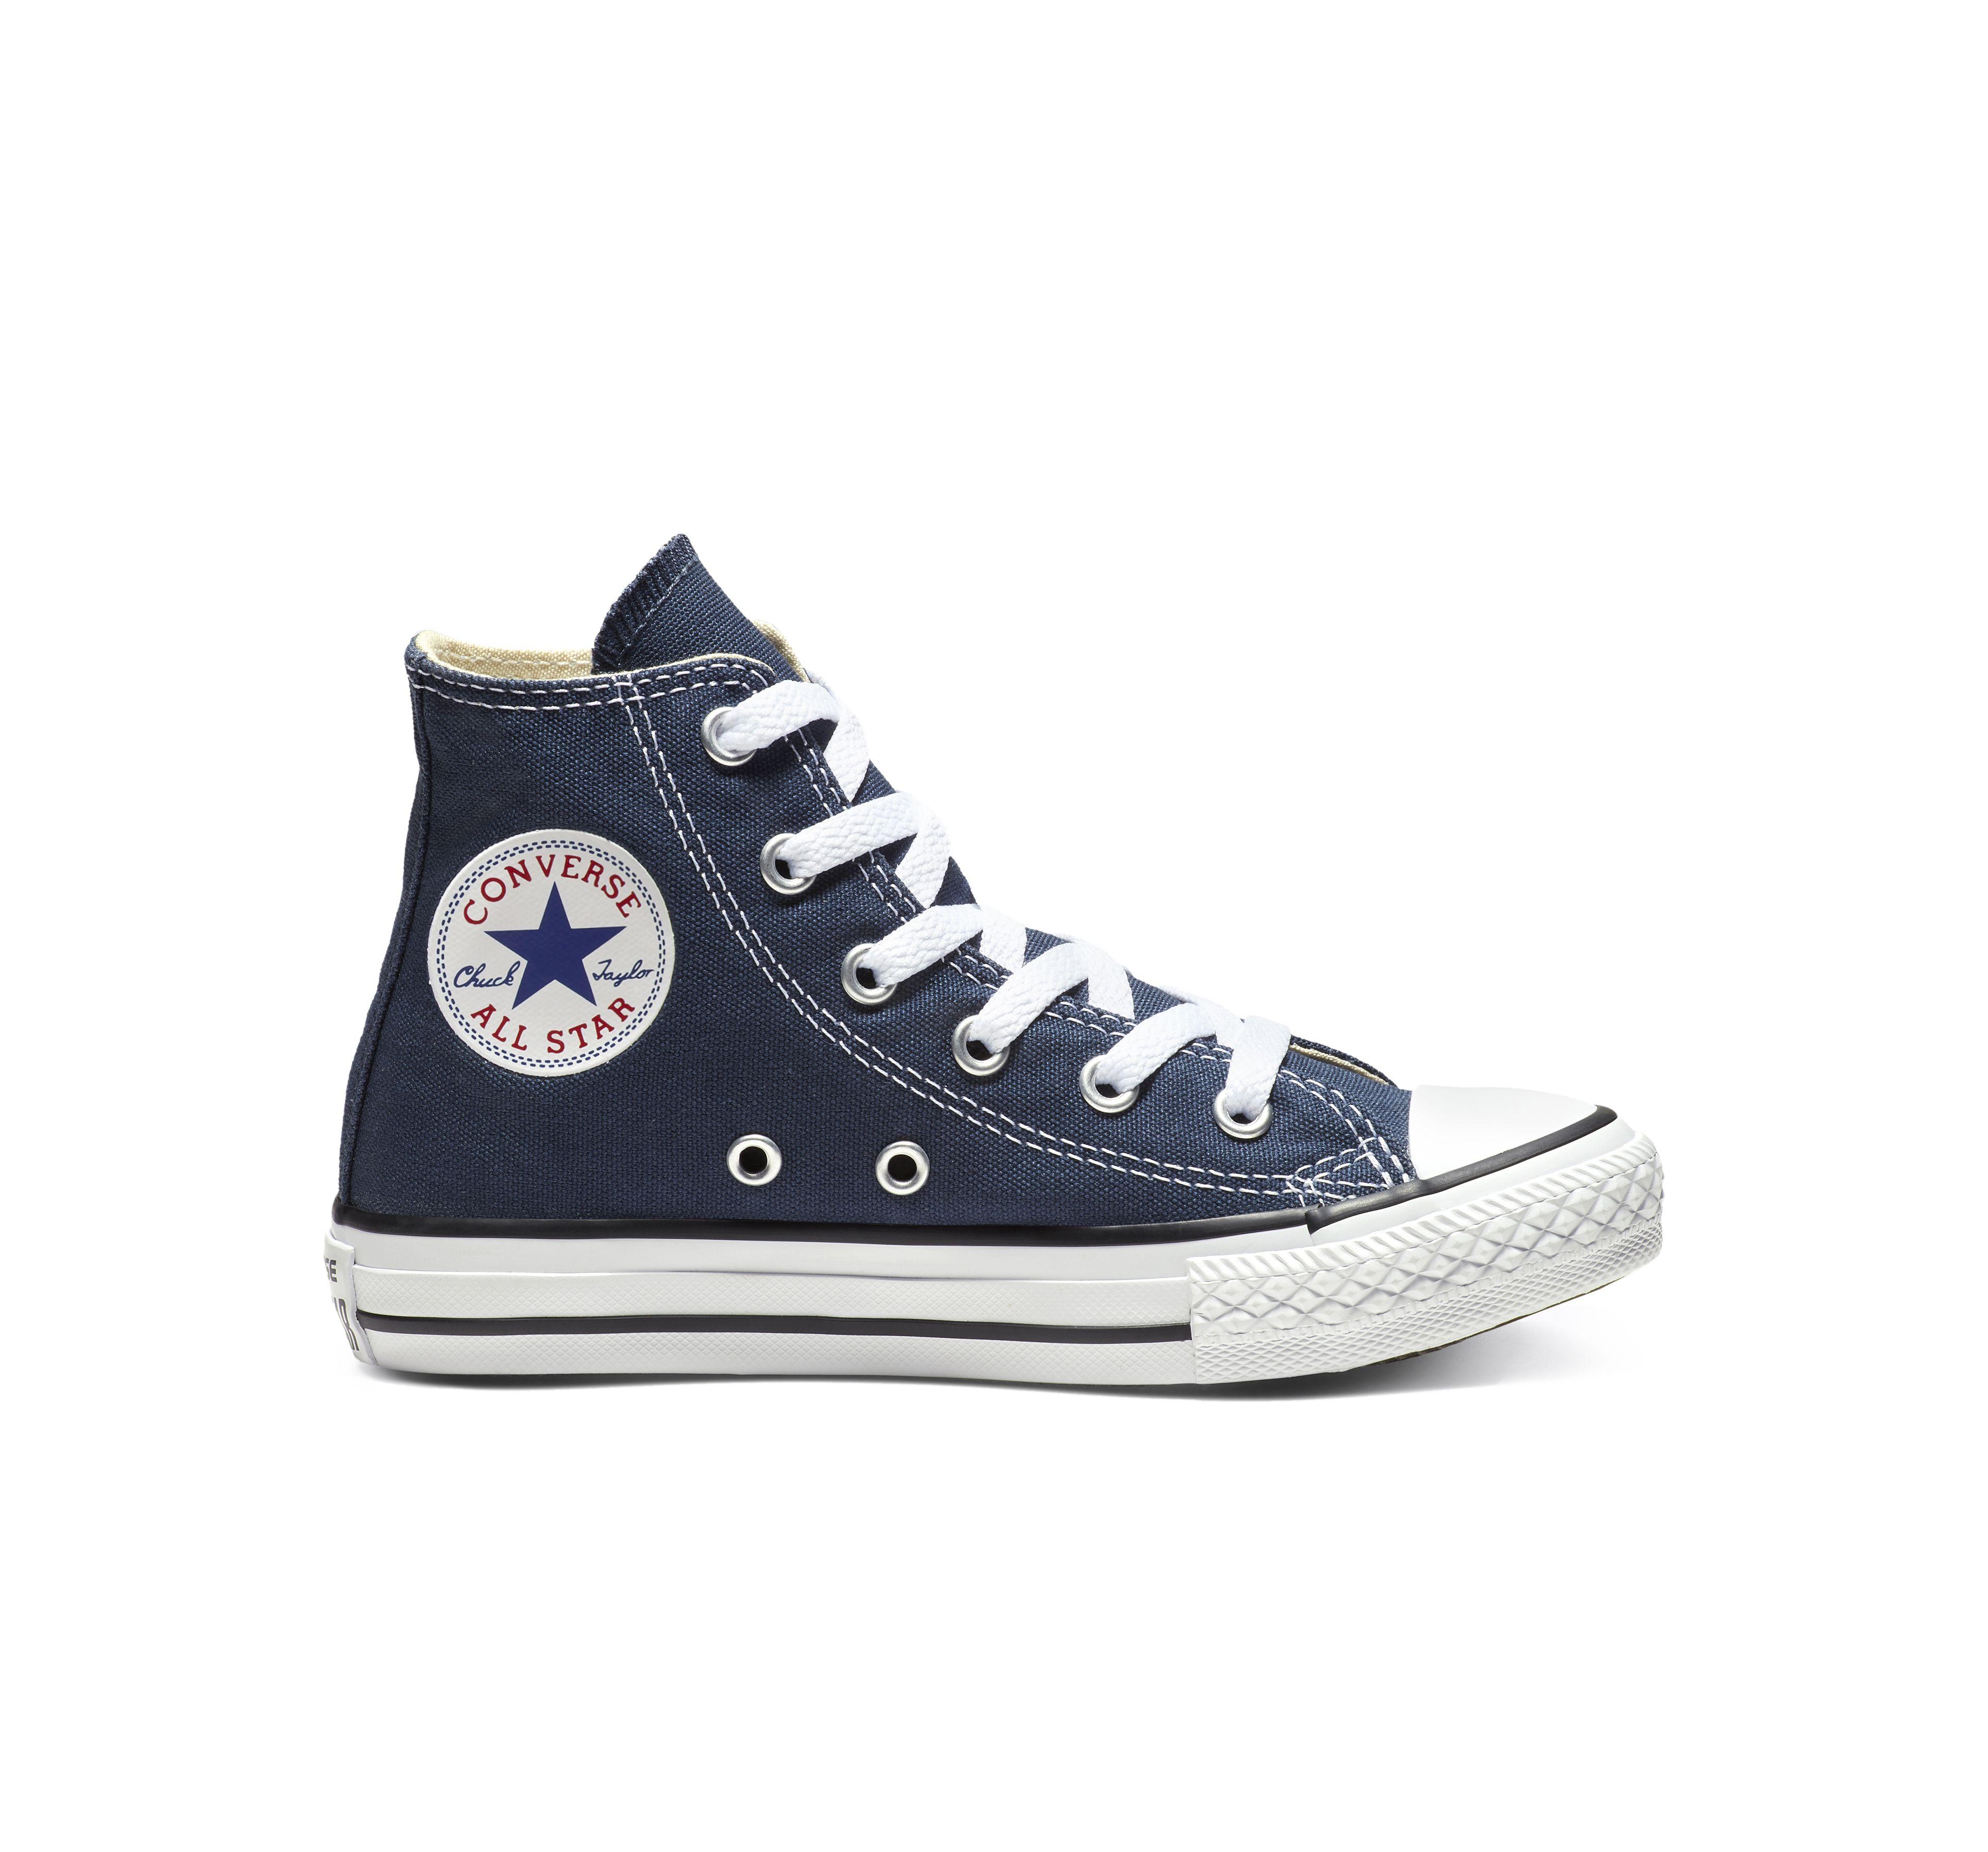 Chuck taylors, Blue converse high tops